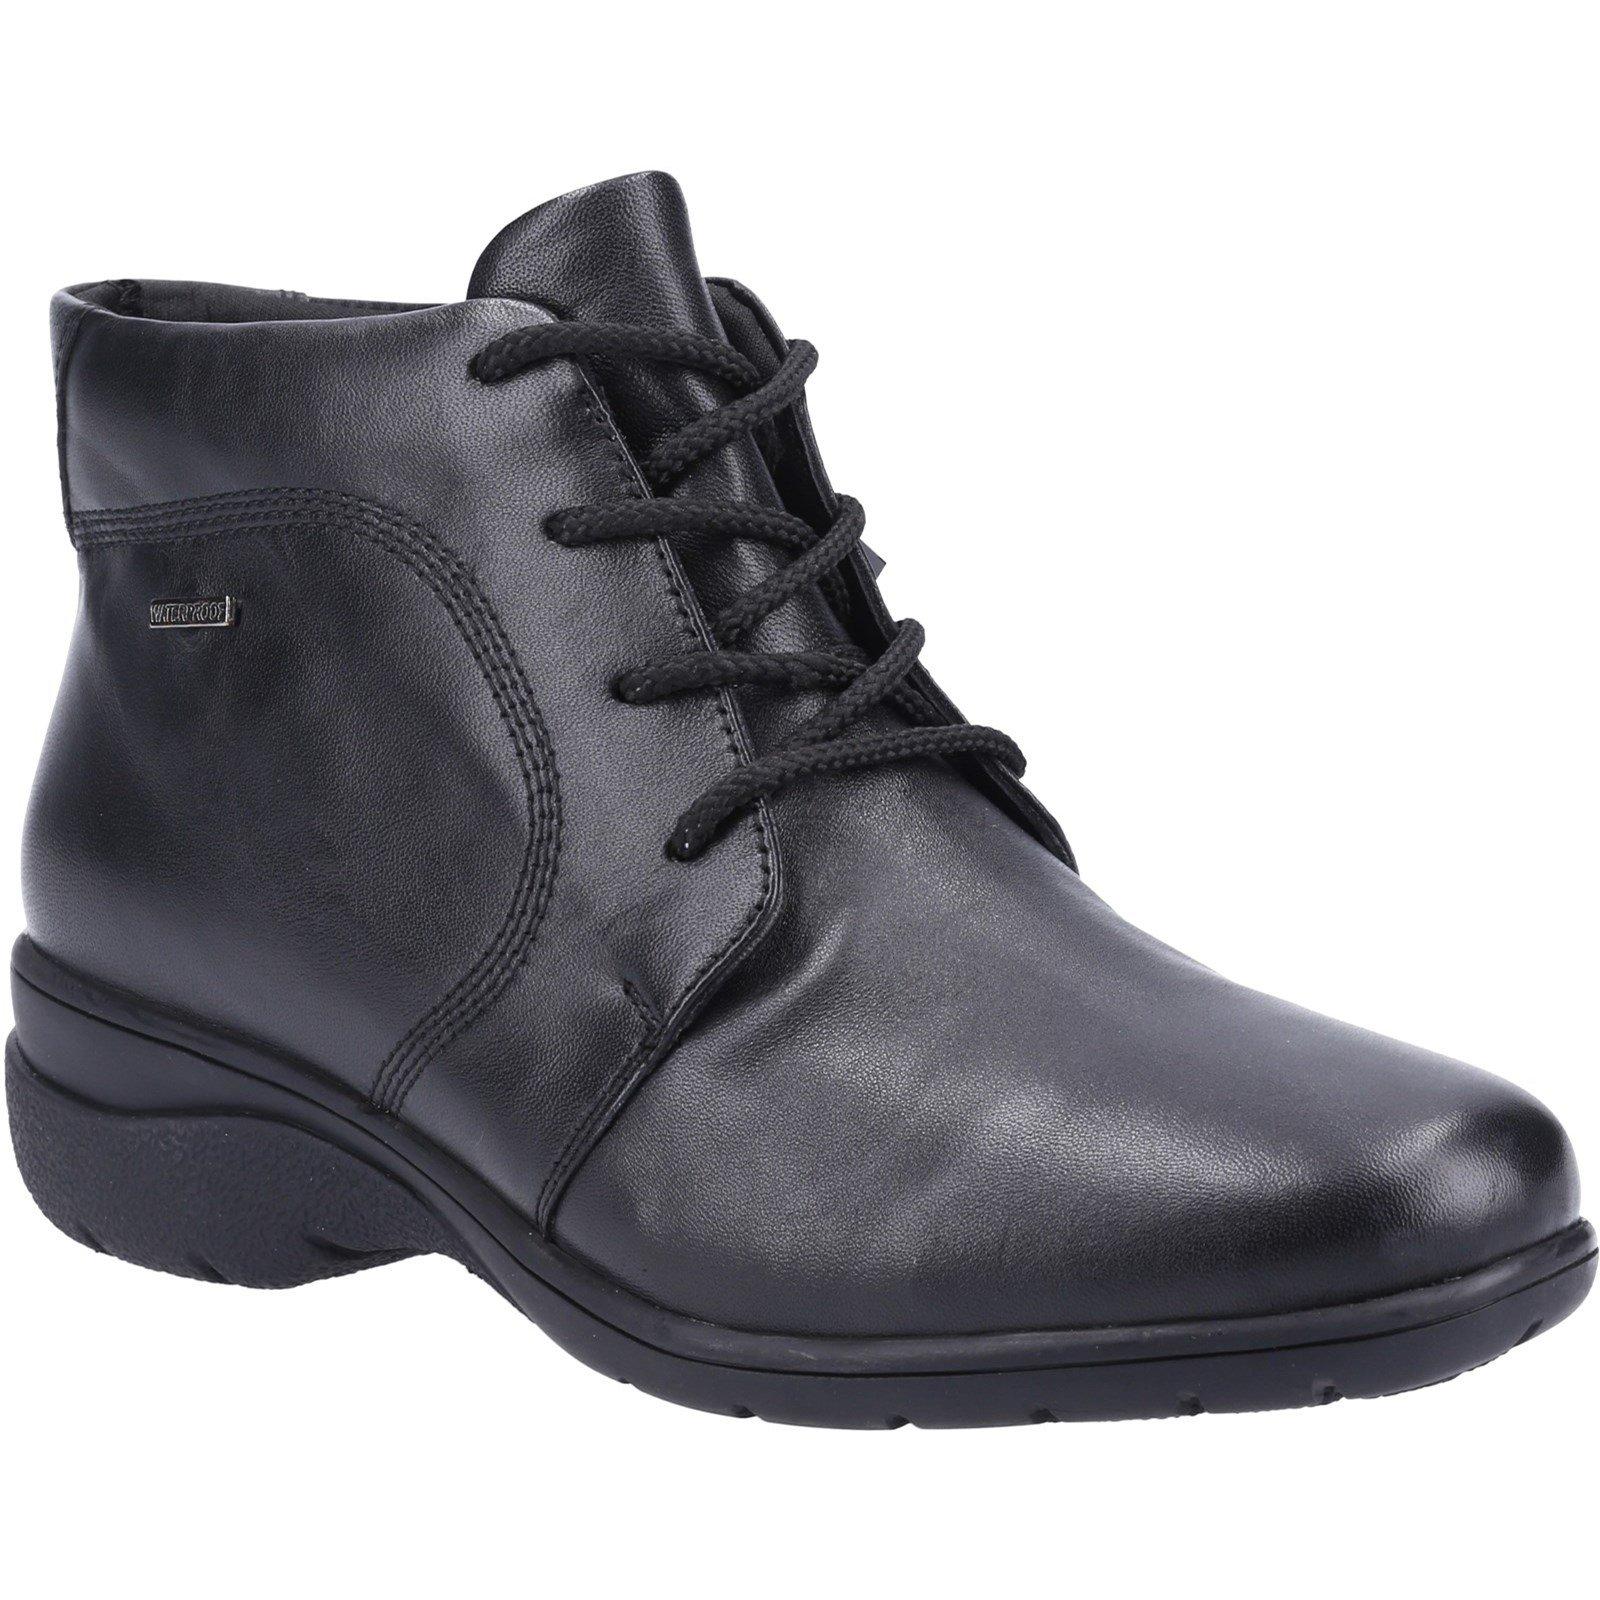 Cotswold Women's Bibury 2 Ankle Boot Black 32978 - Black 8